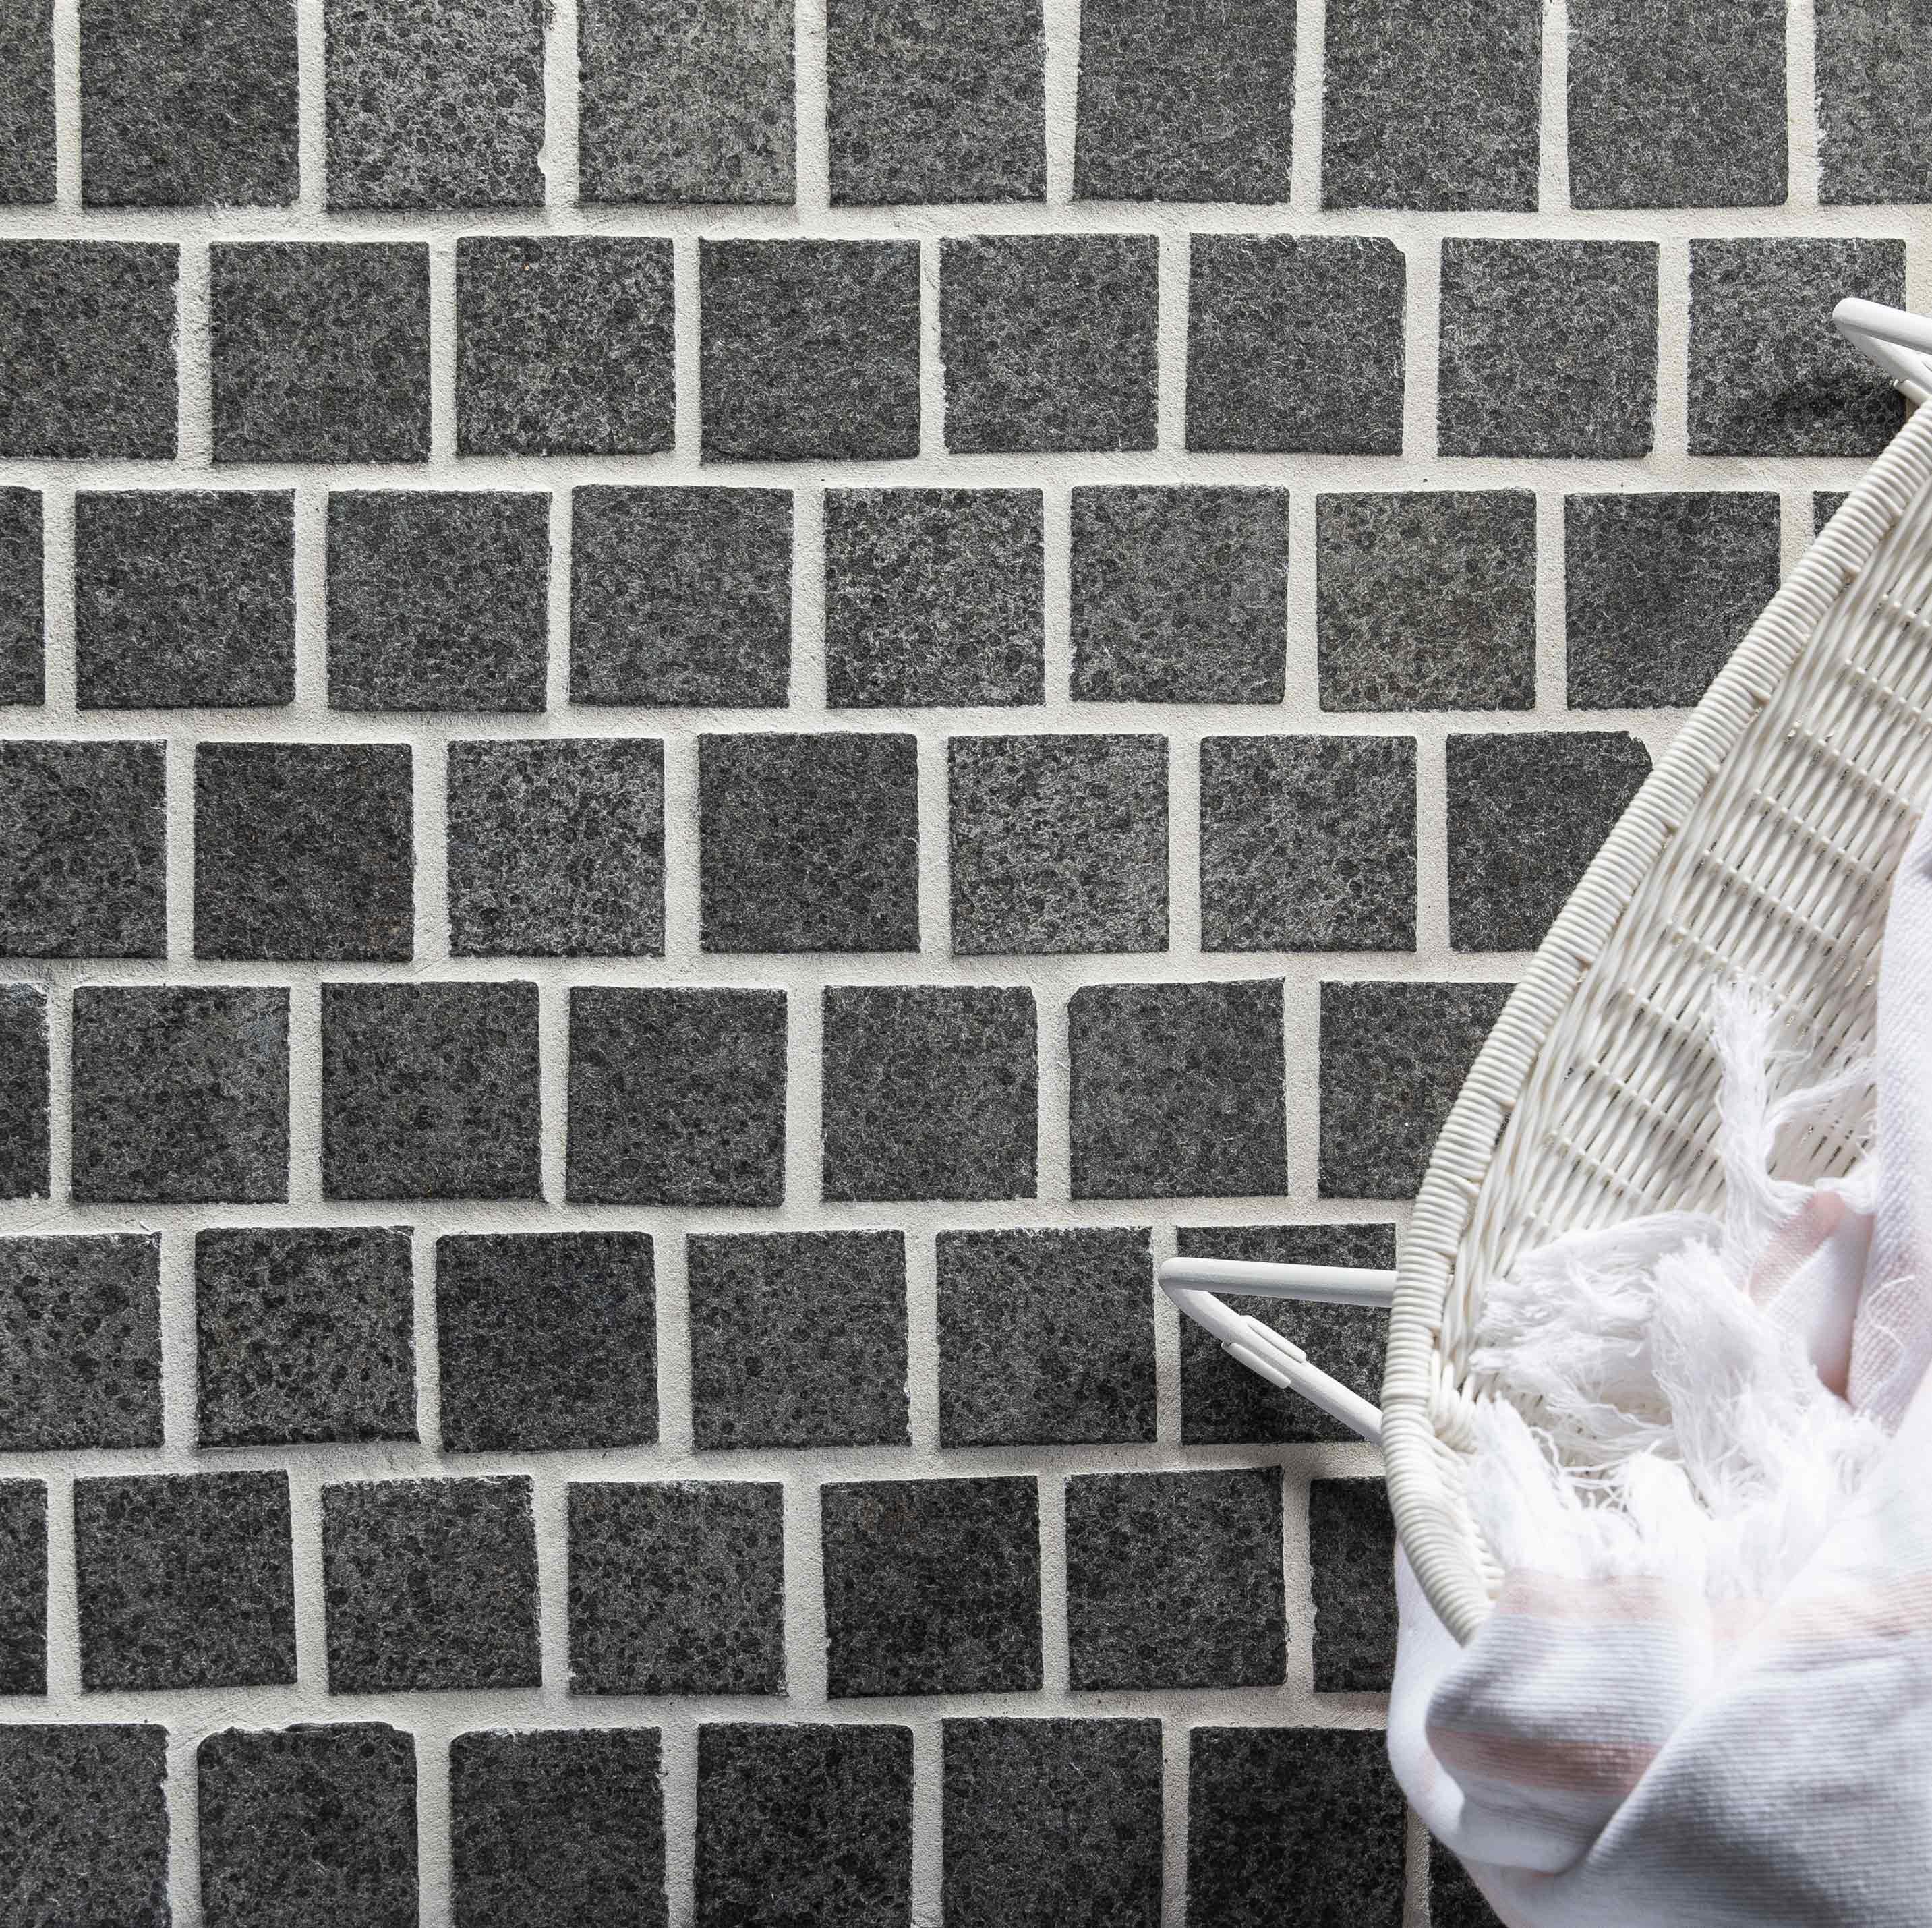 Cobblestones Hero raven-granite-cobblestones-on-mesh